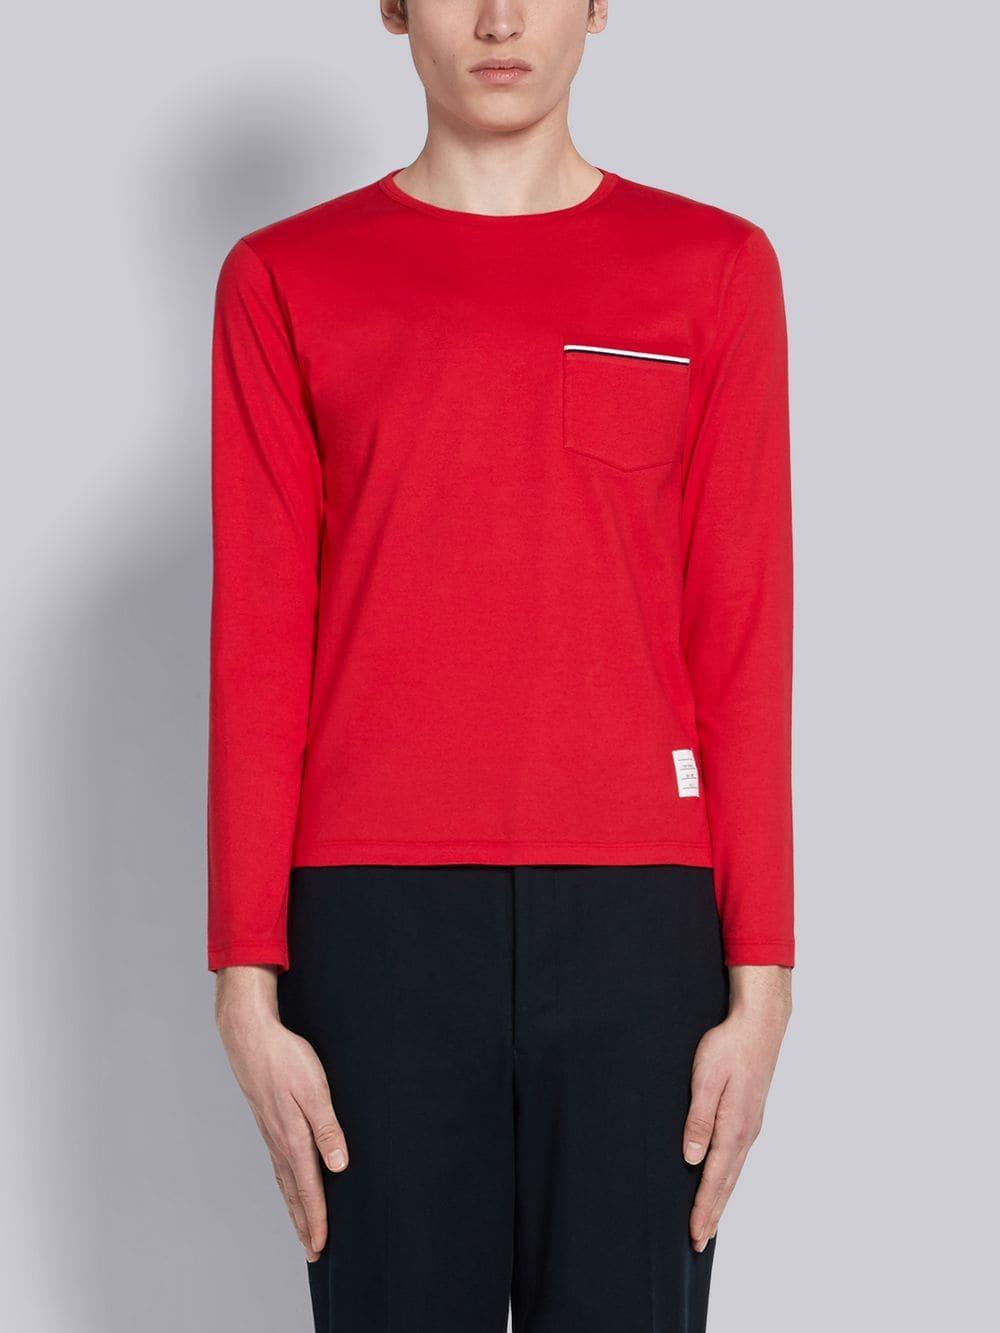 65dea5792b0 Thom Browne Rwb Pocket Trim Long-sleeve Tee in Red for Men - Lyst